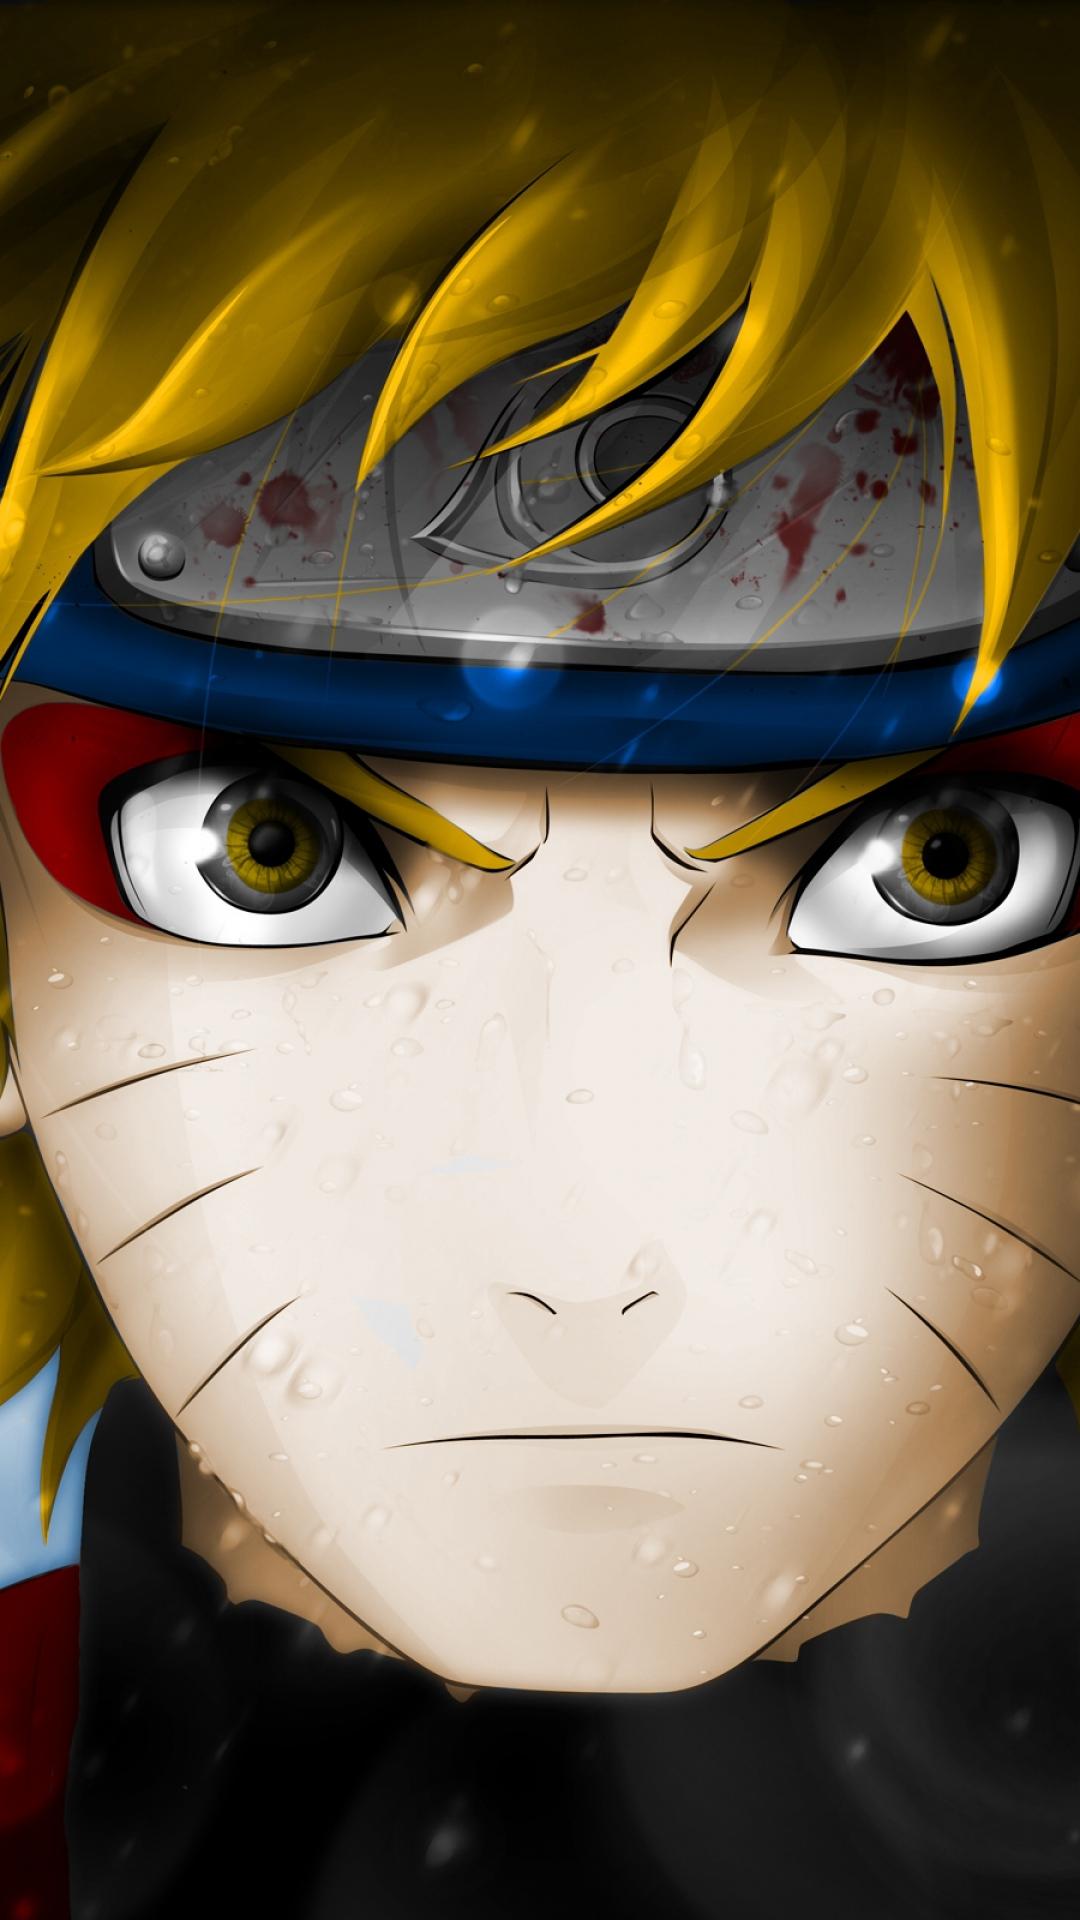 Cool Naruto Wallpapers 1080x1920 Download Hd Wallpaper Wallpapertip